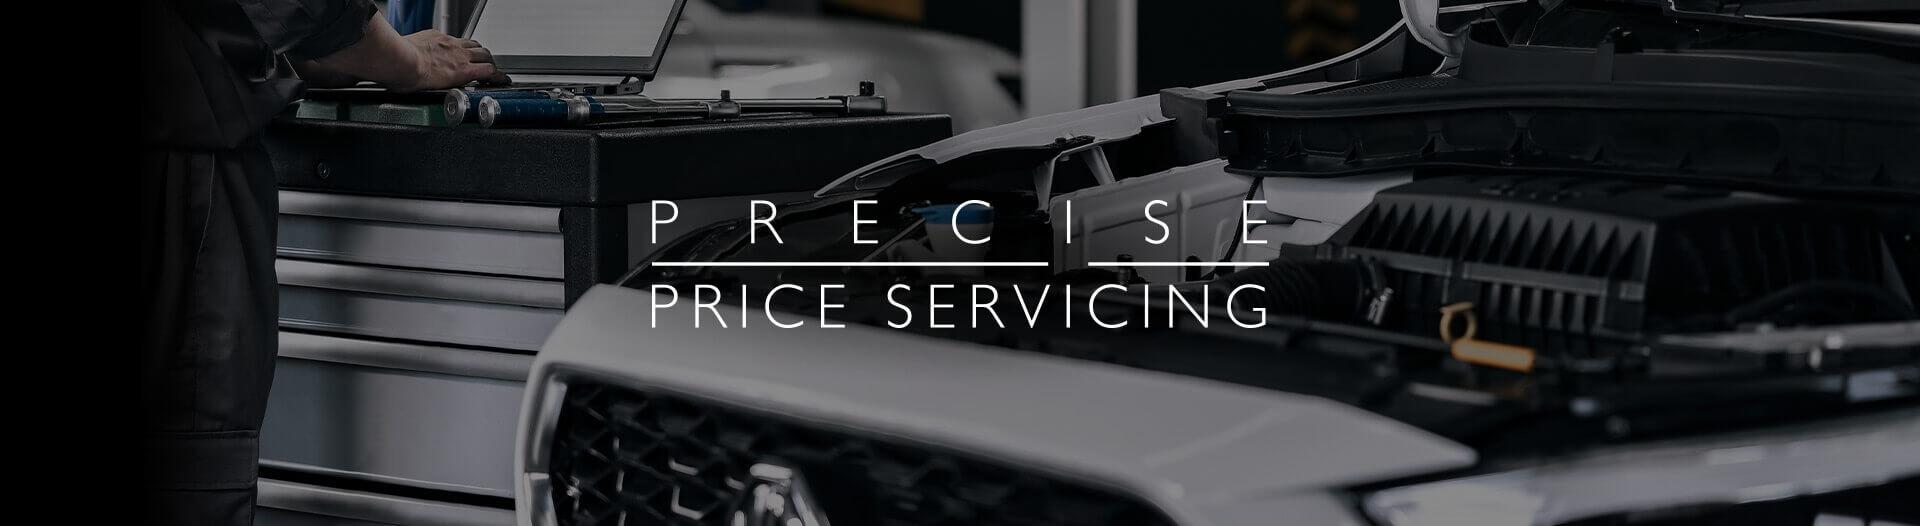 MG Precise Price Servicing